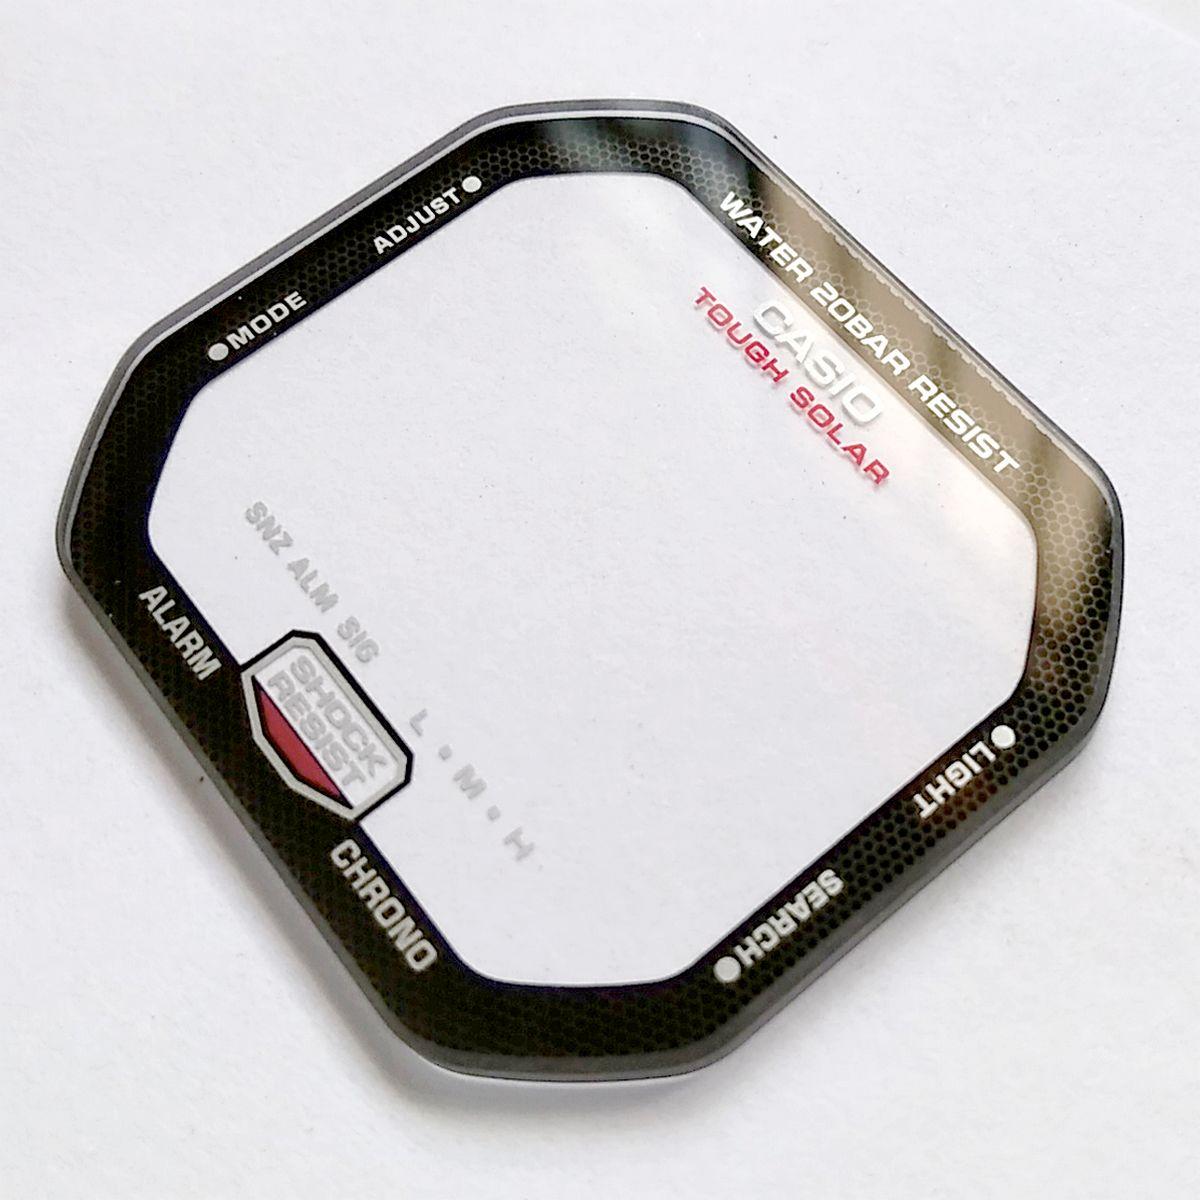 Vidro Mineral Original Casio G-shock GX-56-1b  - E-Presentes